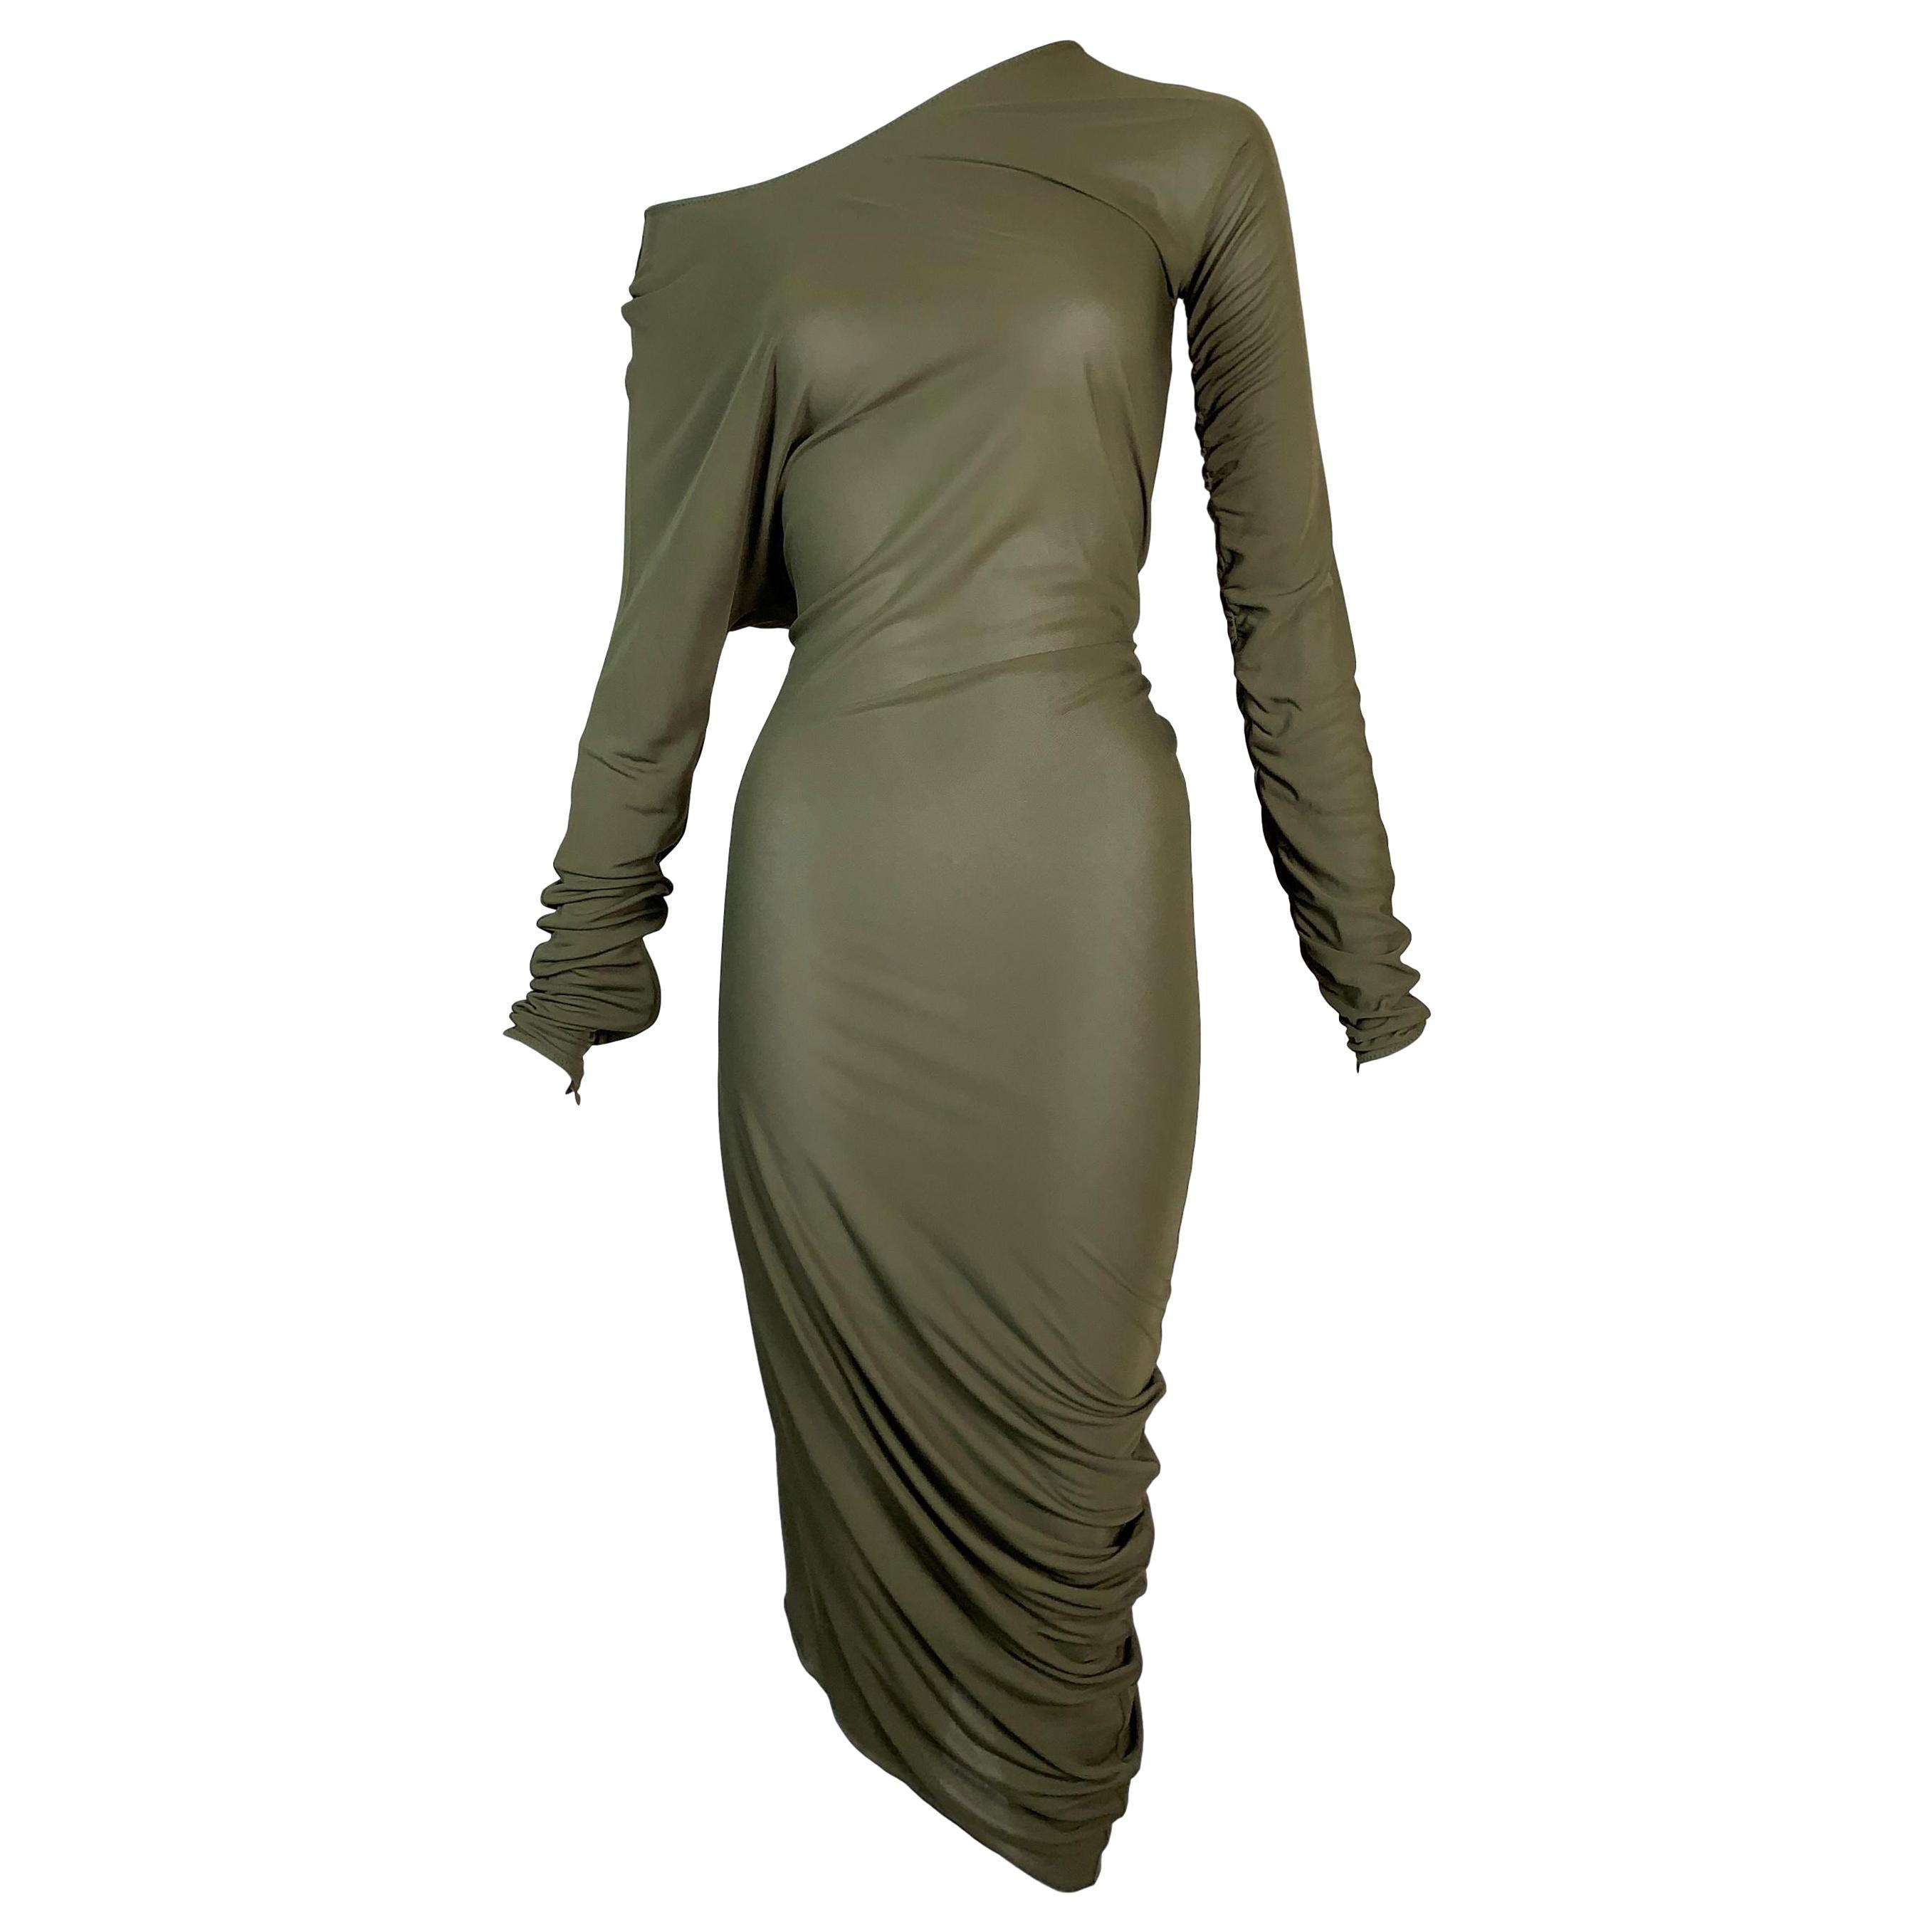 2000's Jean Paul Gaultier Sheer Green Asymmetrical Off Shoulder Ruched Dress